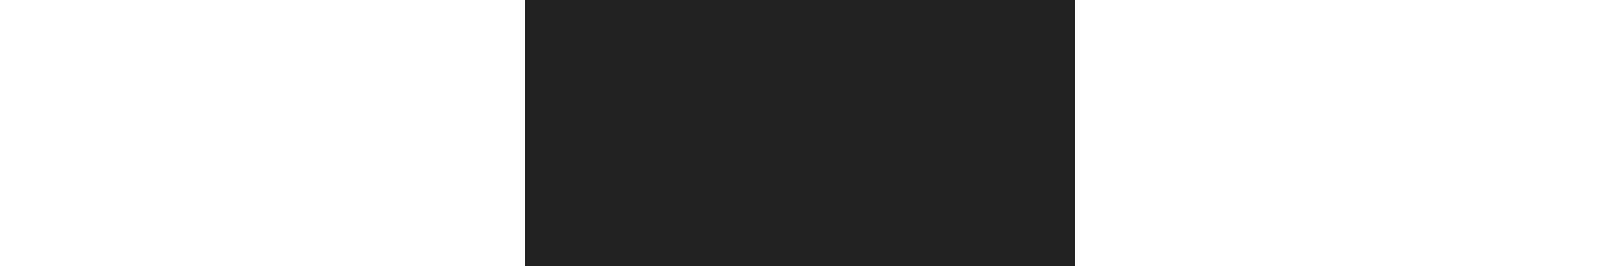 錫高|SUZUTAKA STORE